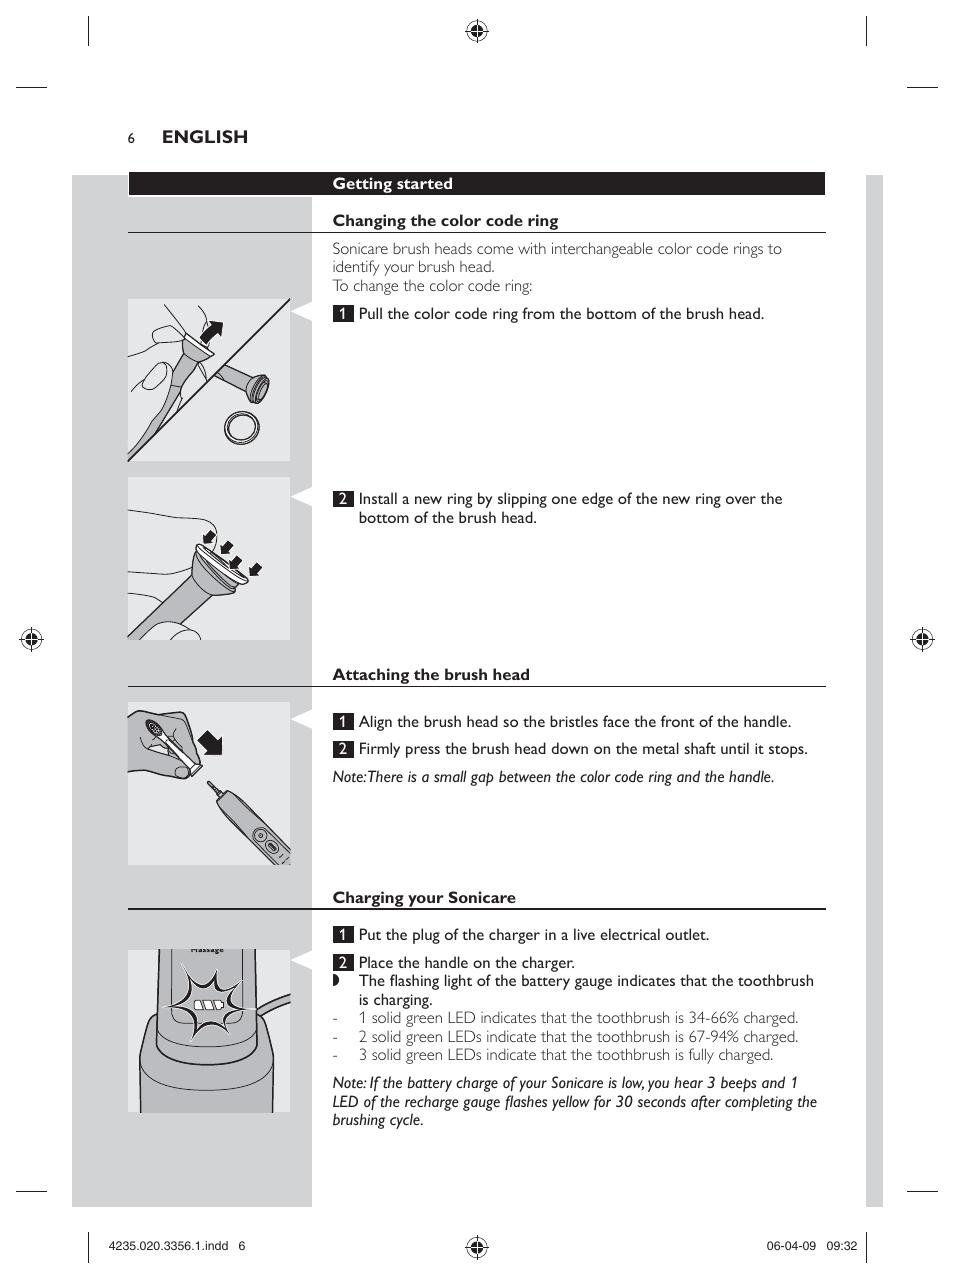 philips sonicare hx6972 10 user manual page 6 44 original mode rh manualsdir com philips sonicare diamondclean user manual philips sonicare hx 6150 user manual